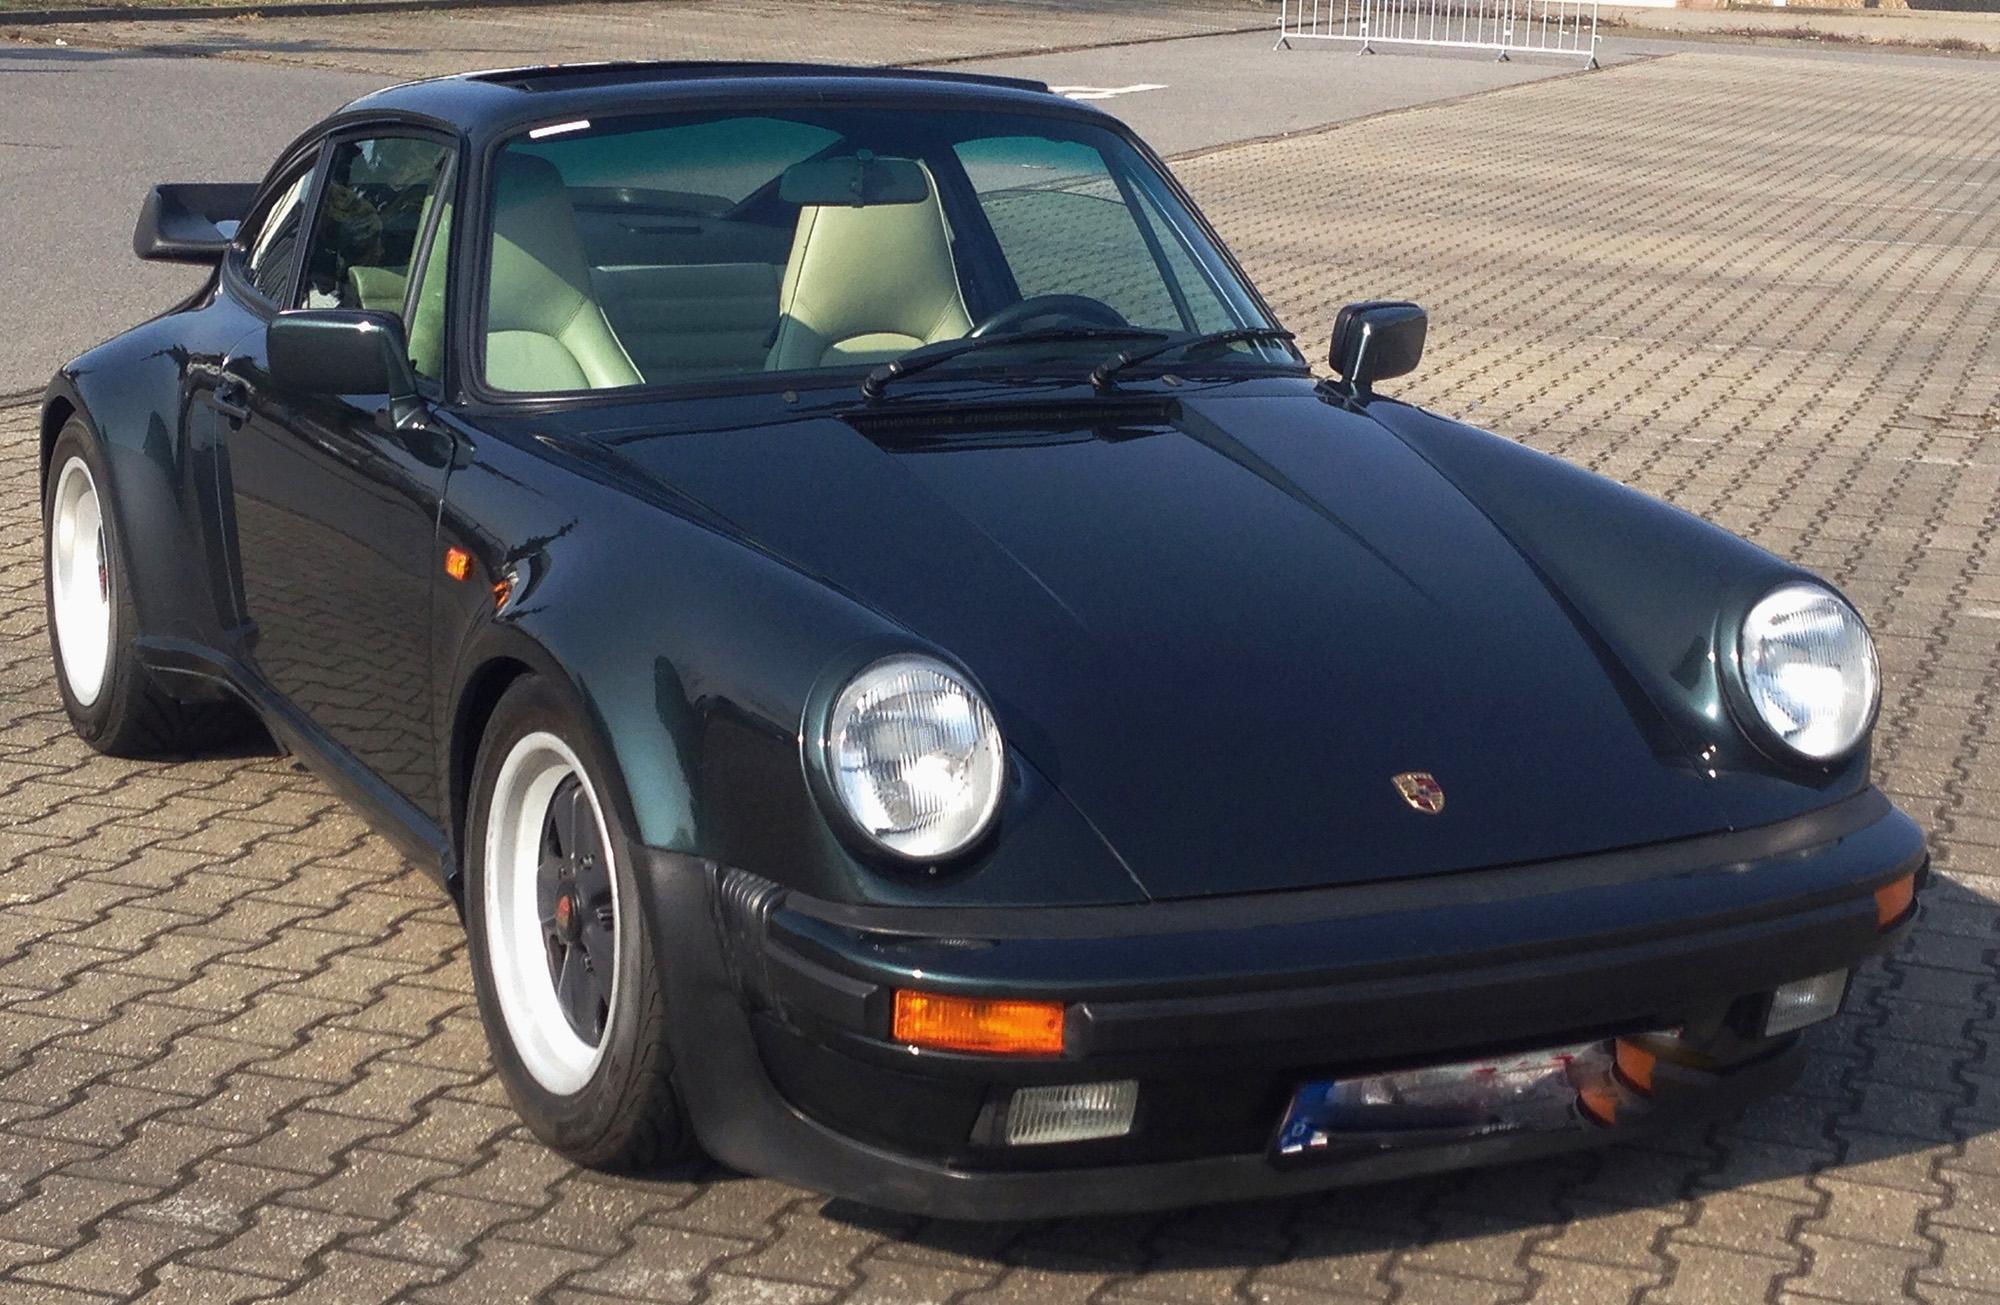 Porsche 911 M470 g modell 1987 g50 nilgrün 2